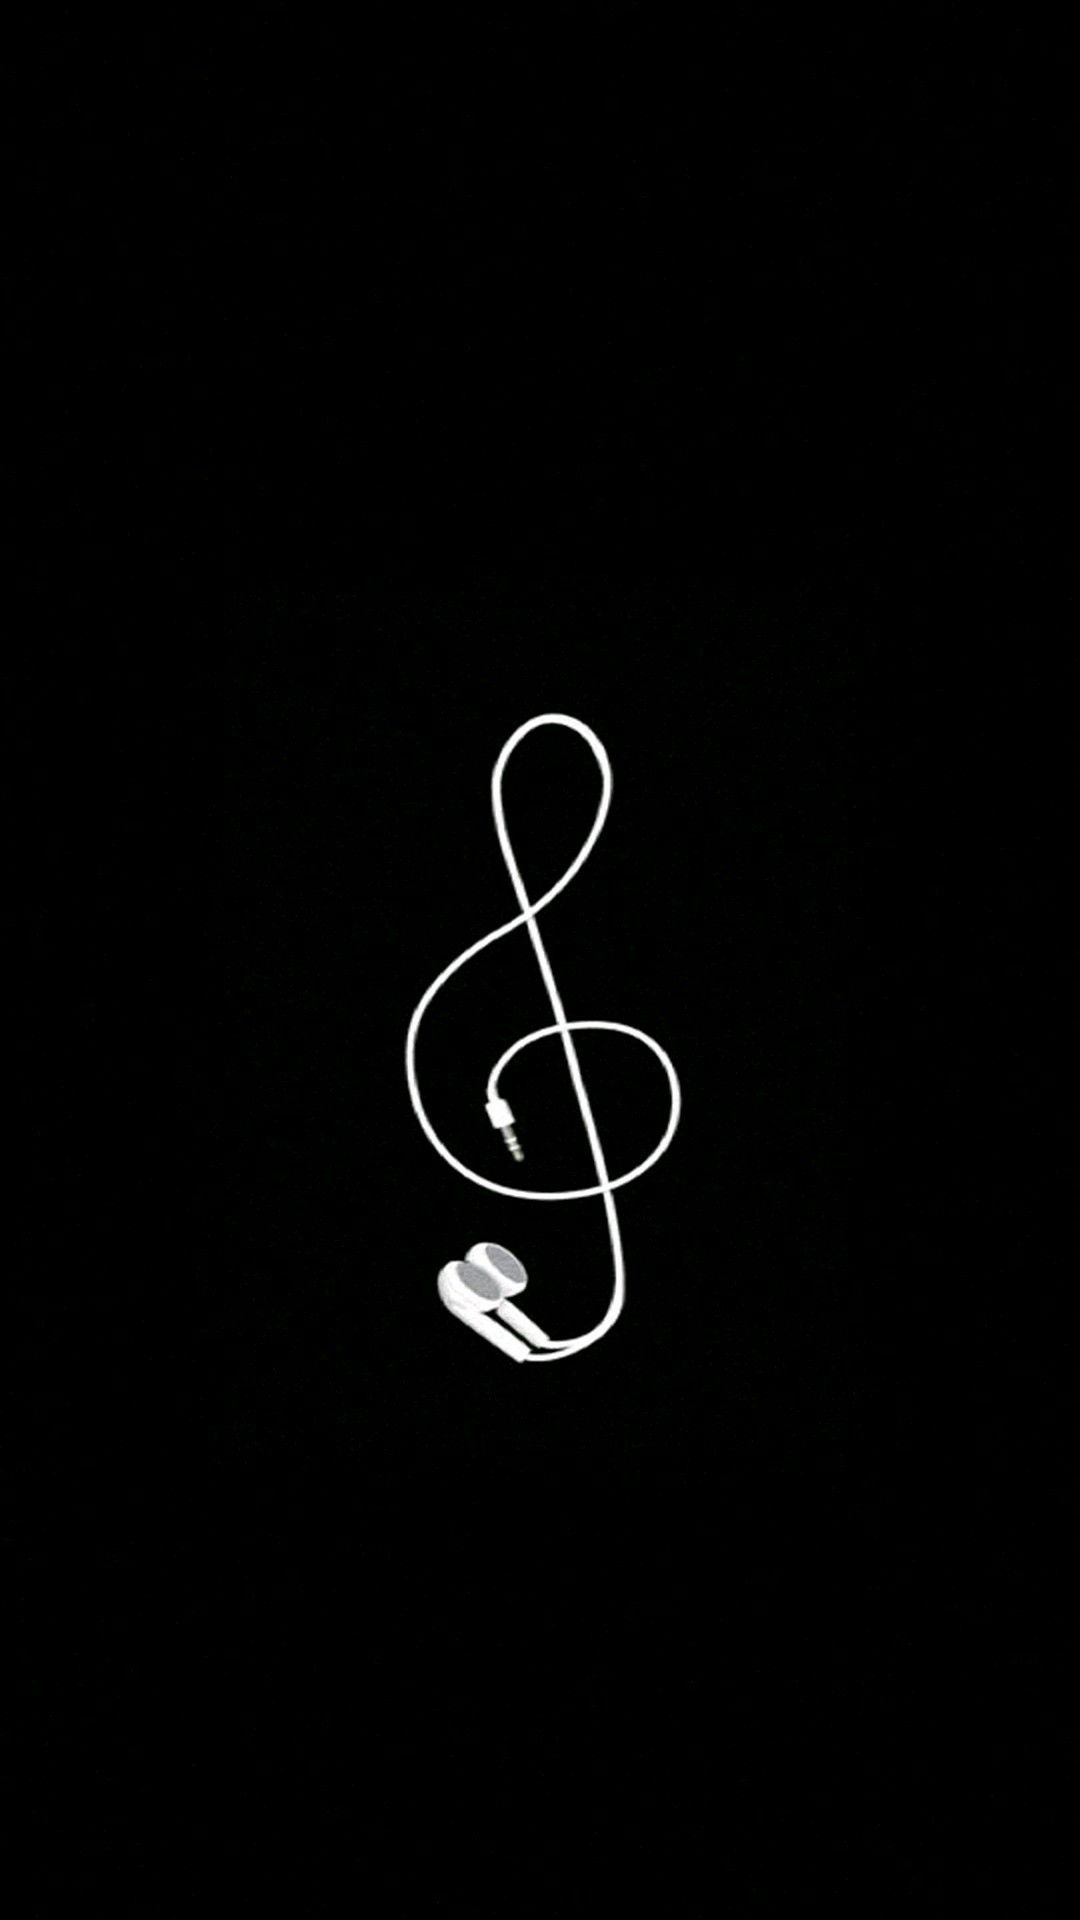 Music Note Background Wallpaper Tumblr Music Wallpaper Wallpaper Iphone Cute